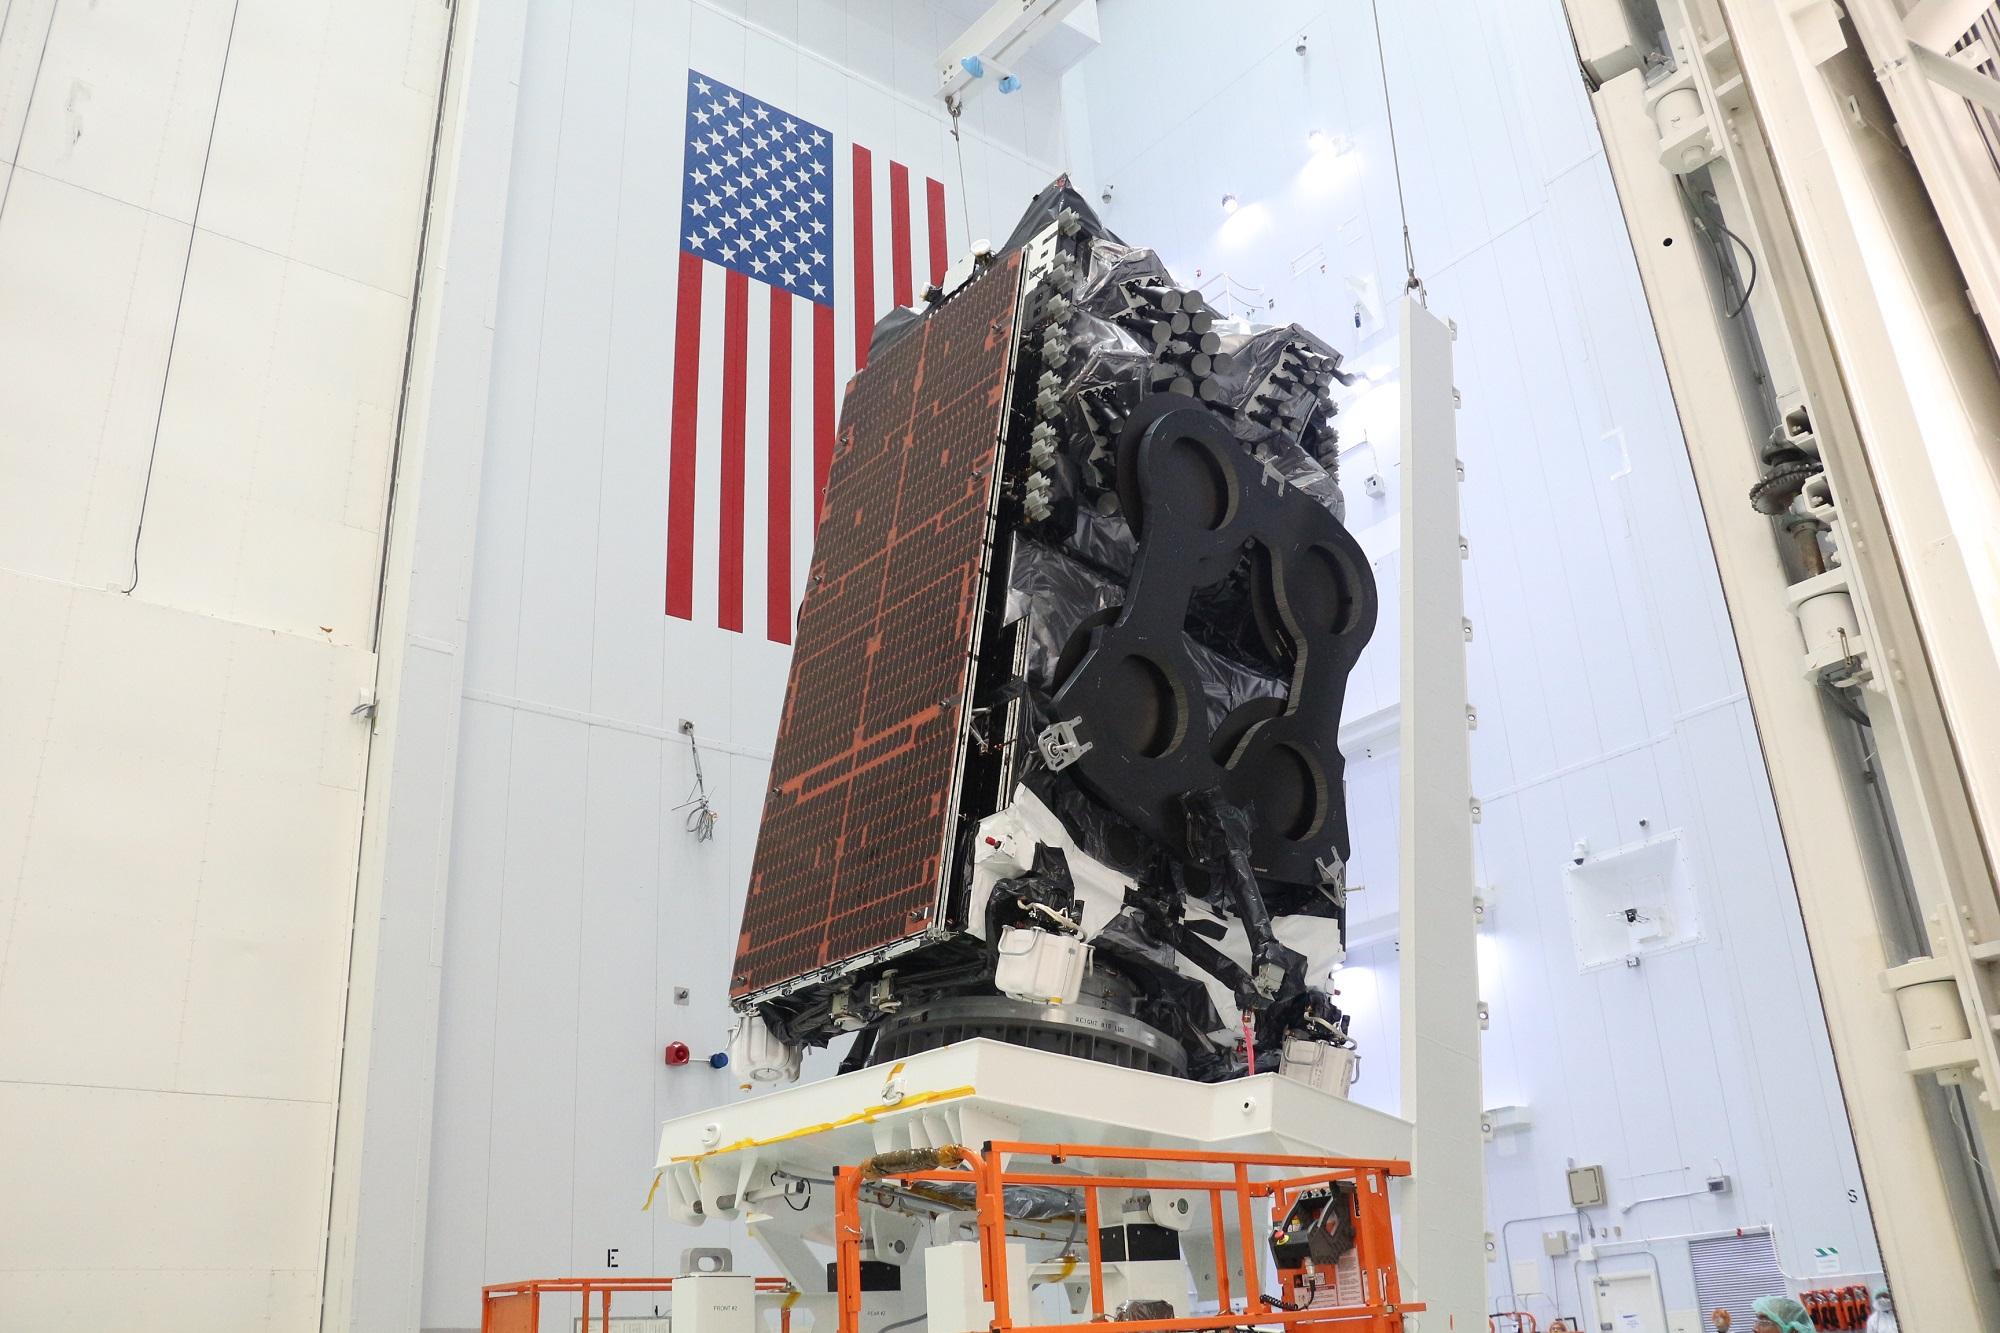 Kacific1-satellite-JCSAT-18-Kacific1-at-SpaceX-launch-facilities-2 (Kacific)